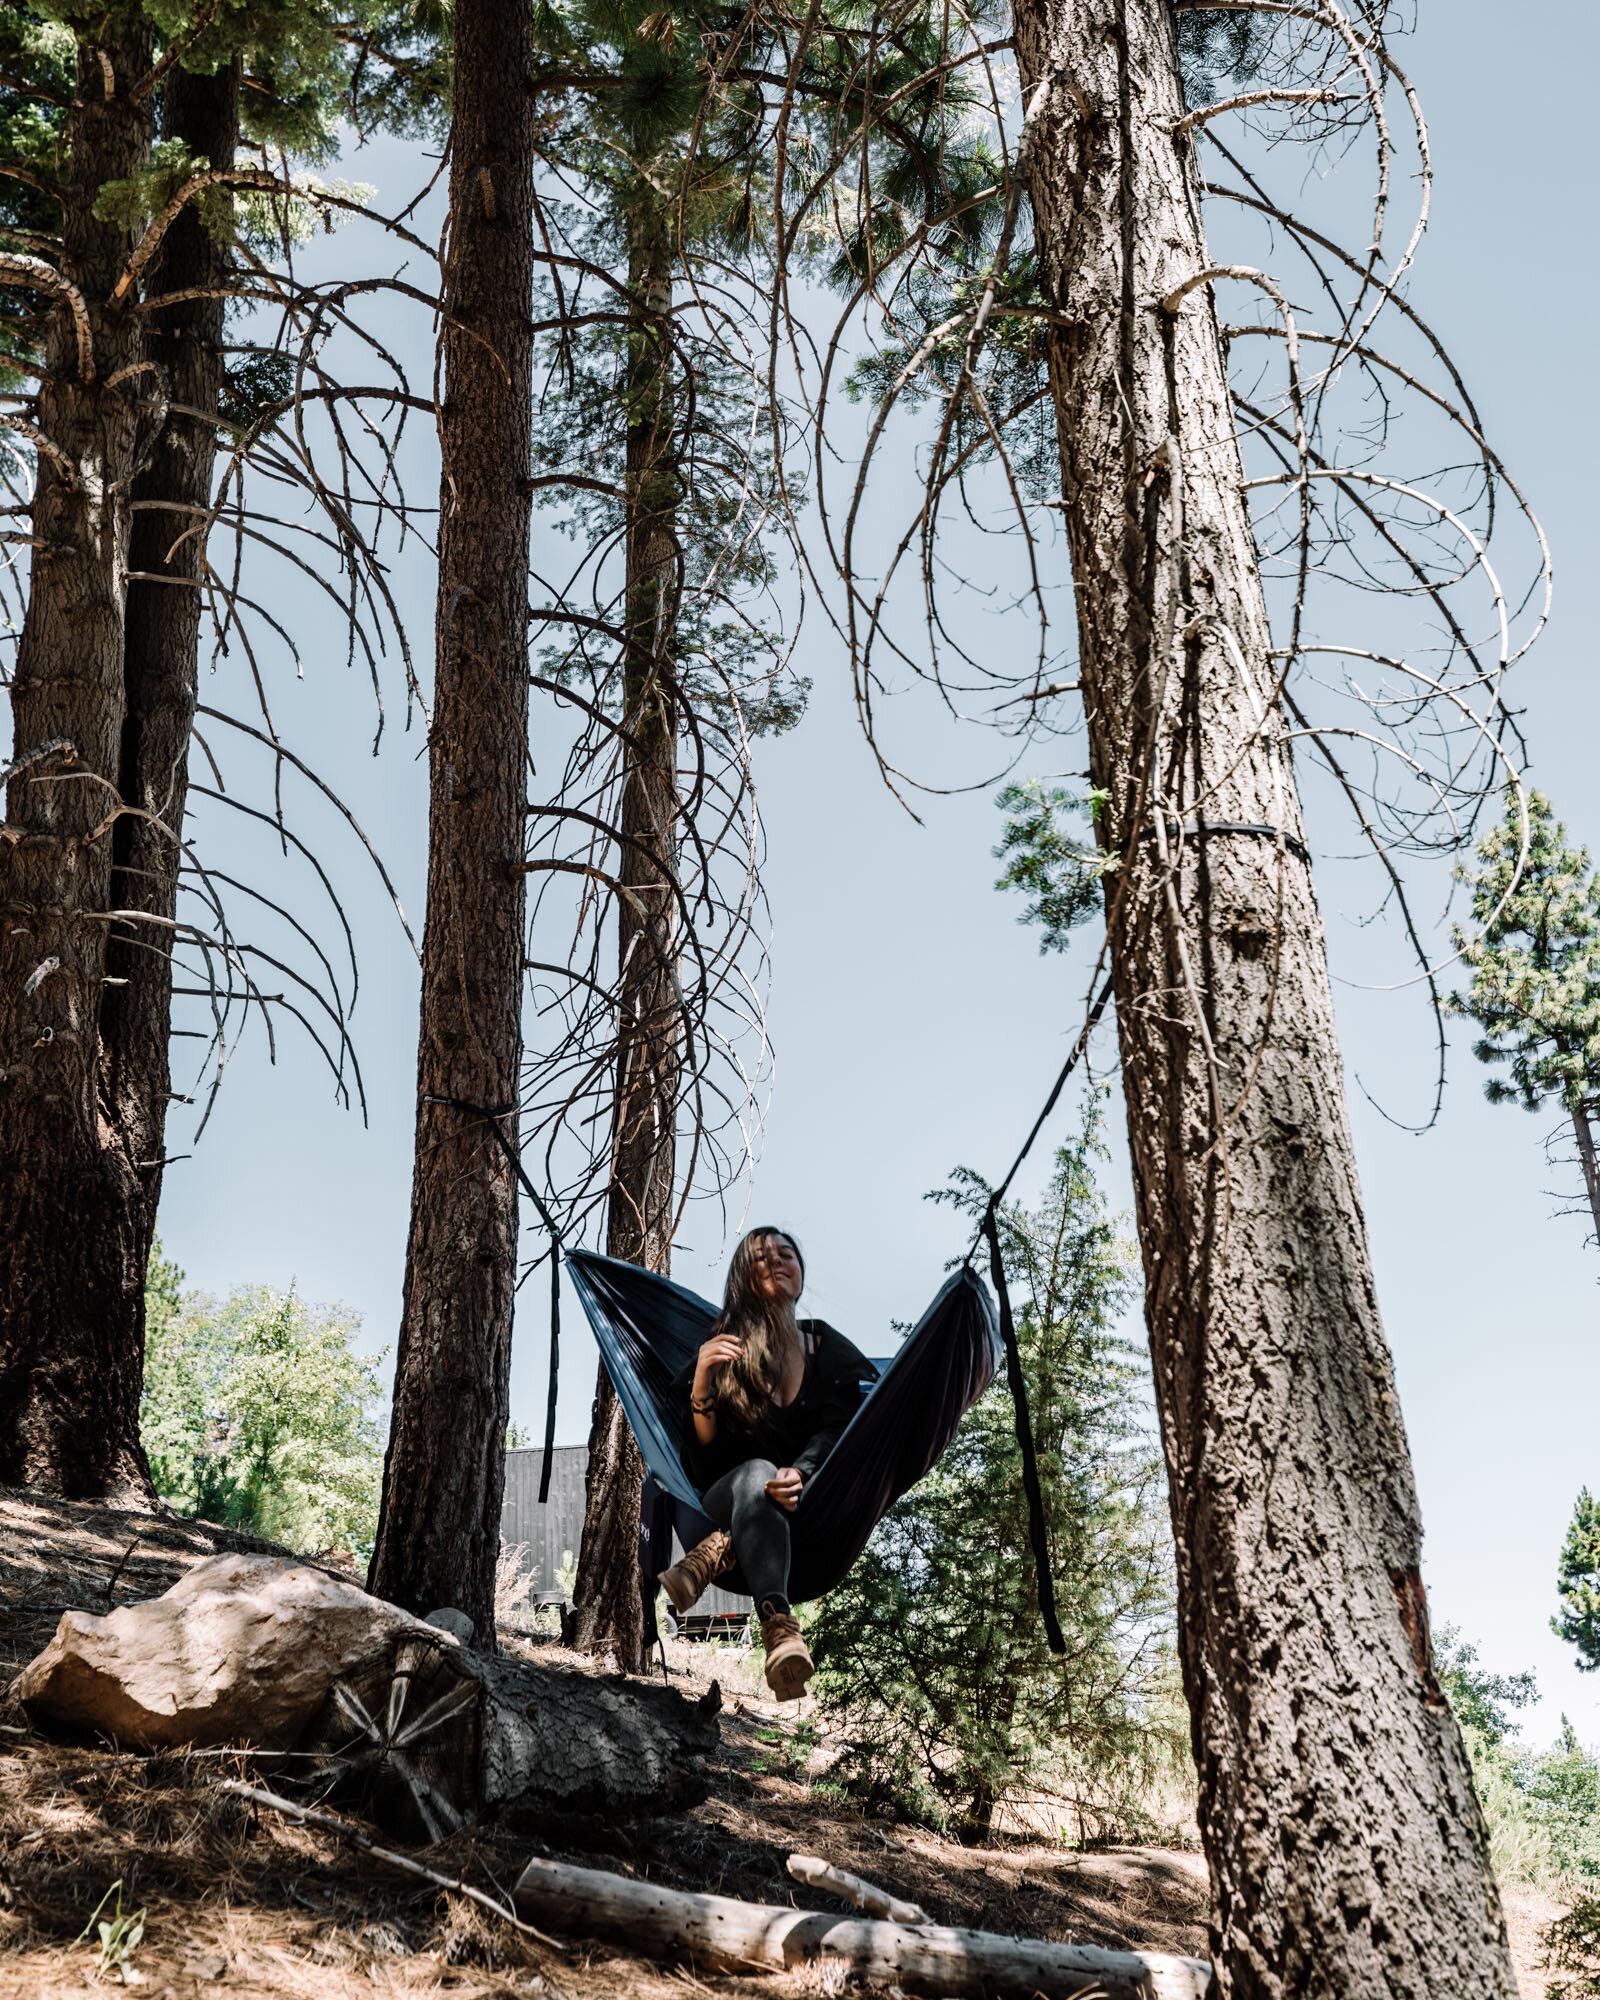 Rachel Off Duty: Girl in Hammock in Big Bear, California